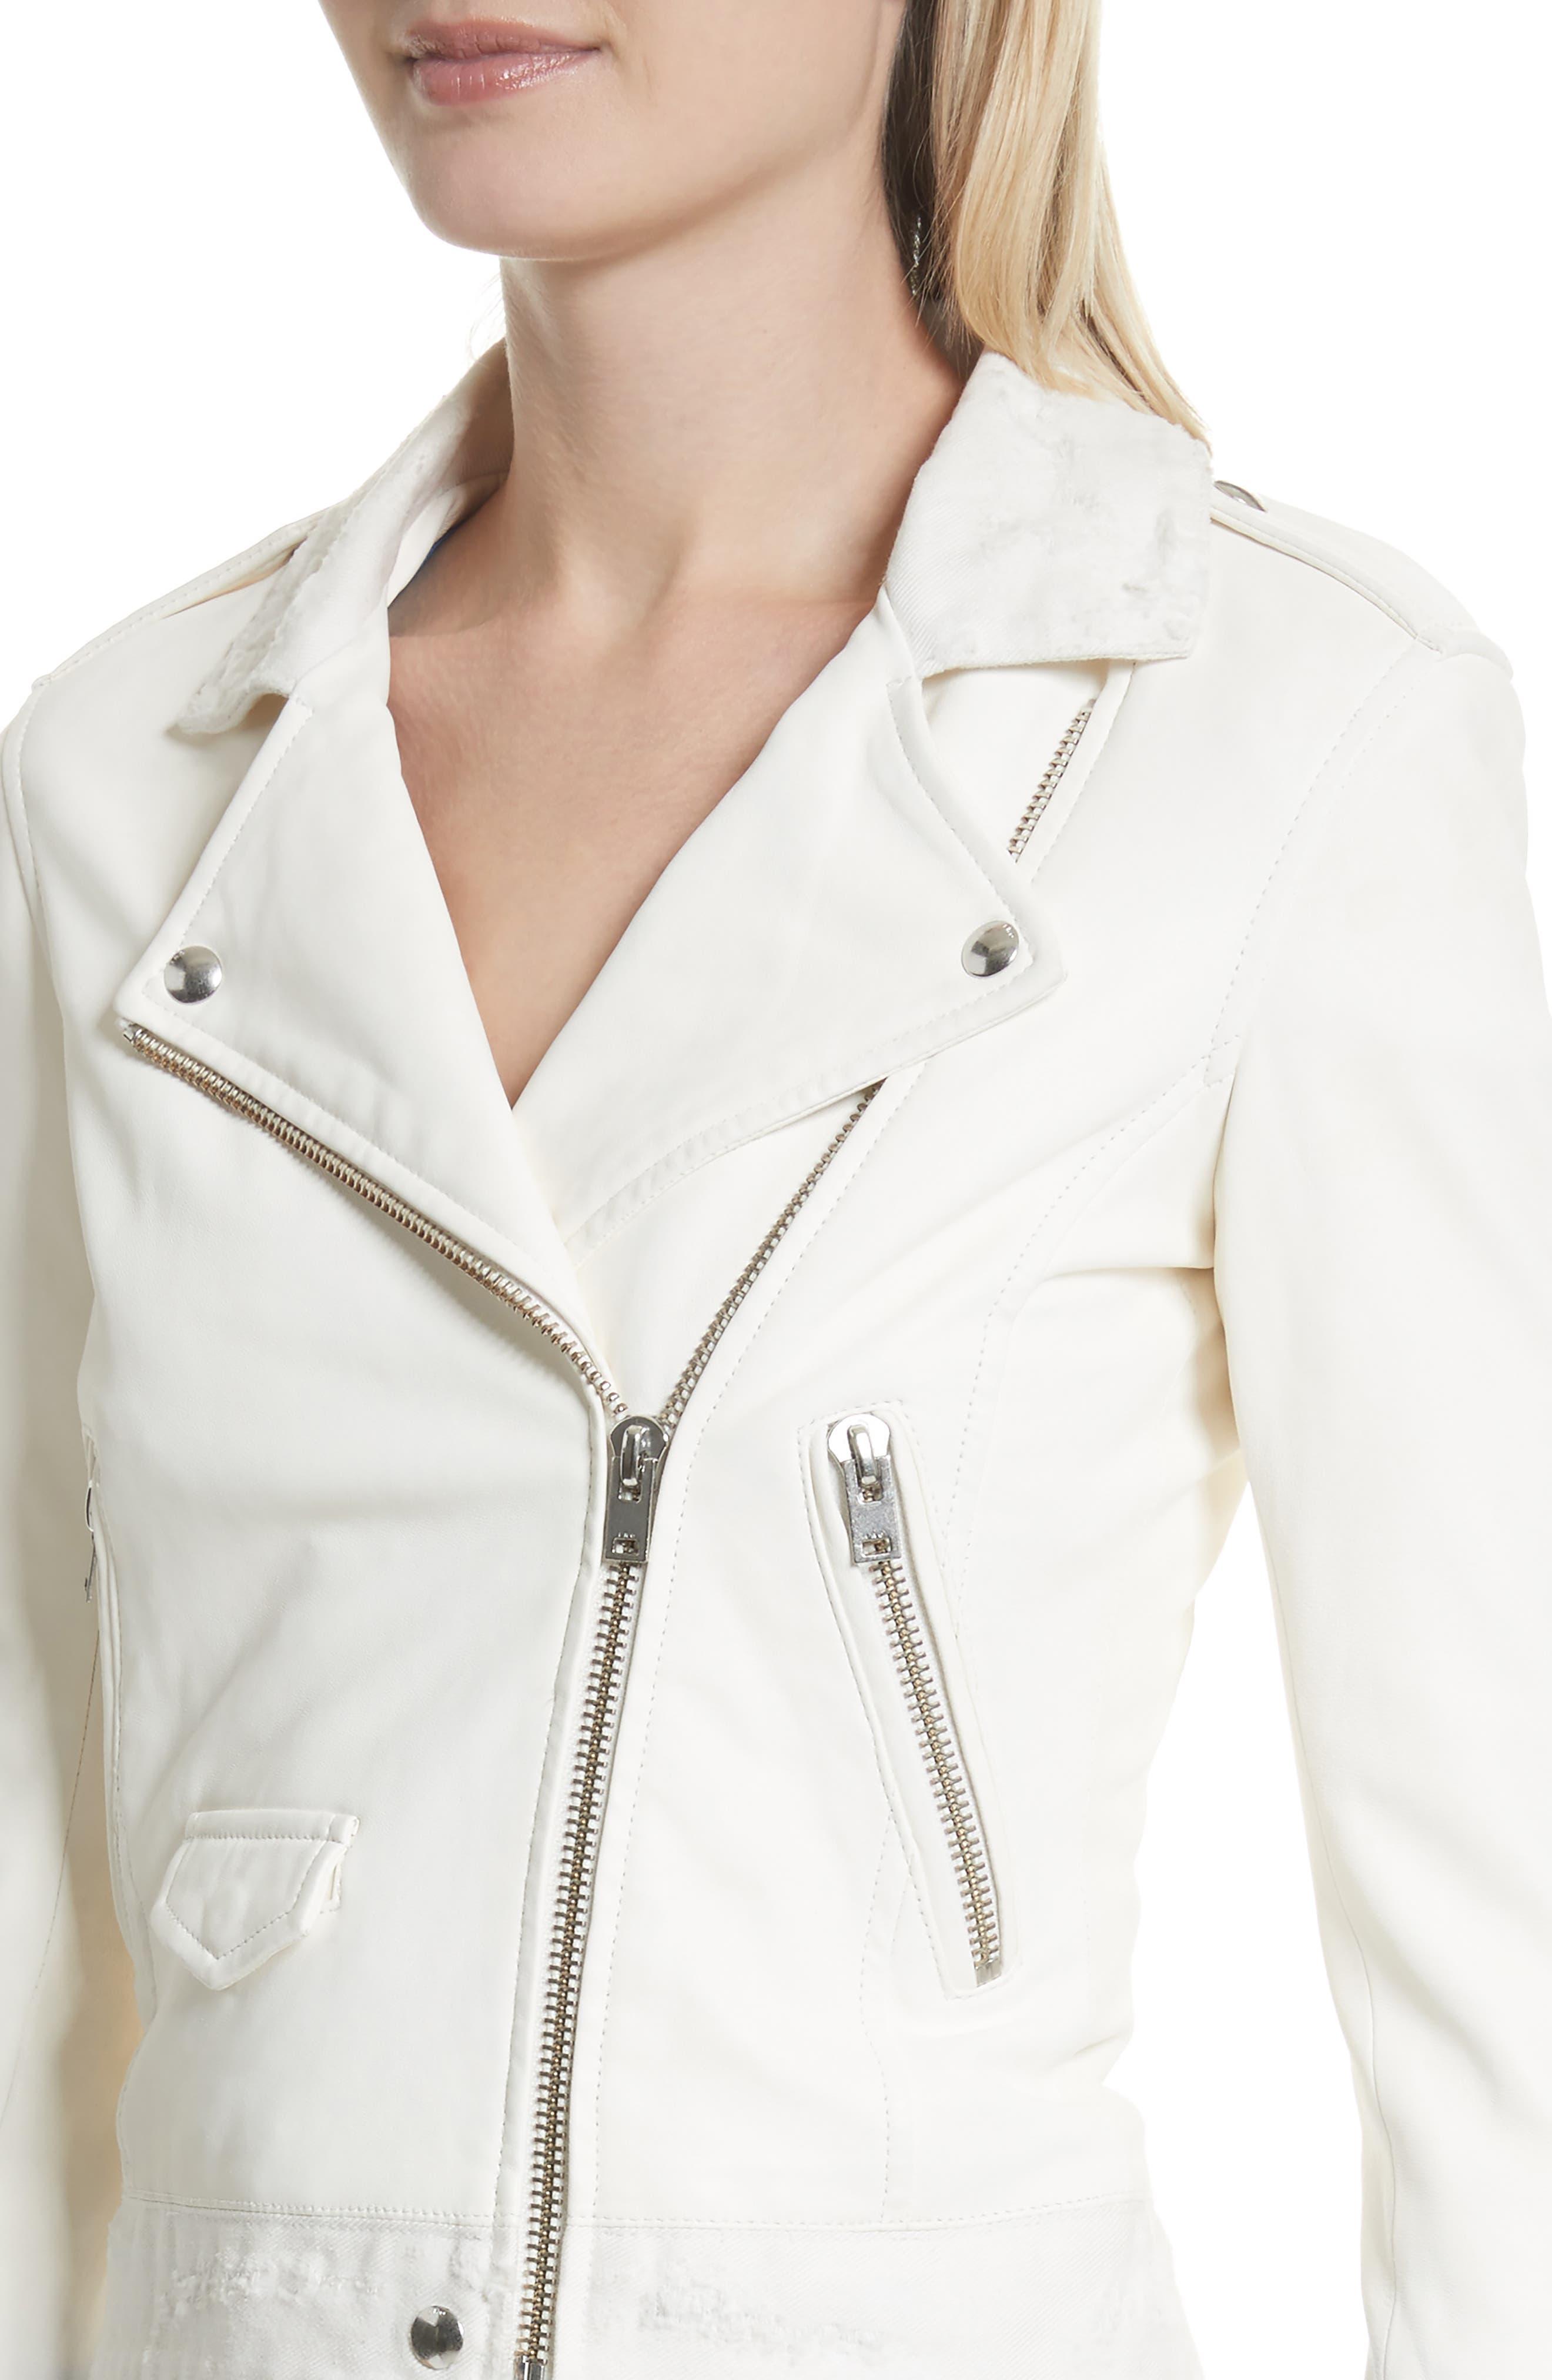 Maldone Denim Trim Leather Moto Jacket,                             Alternate thumbnail 4, color,